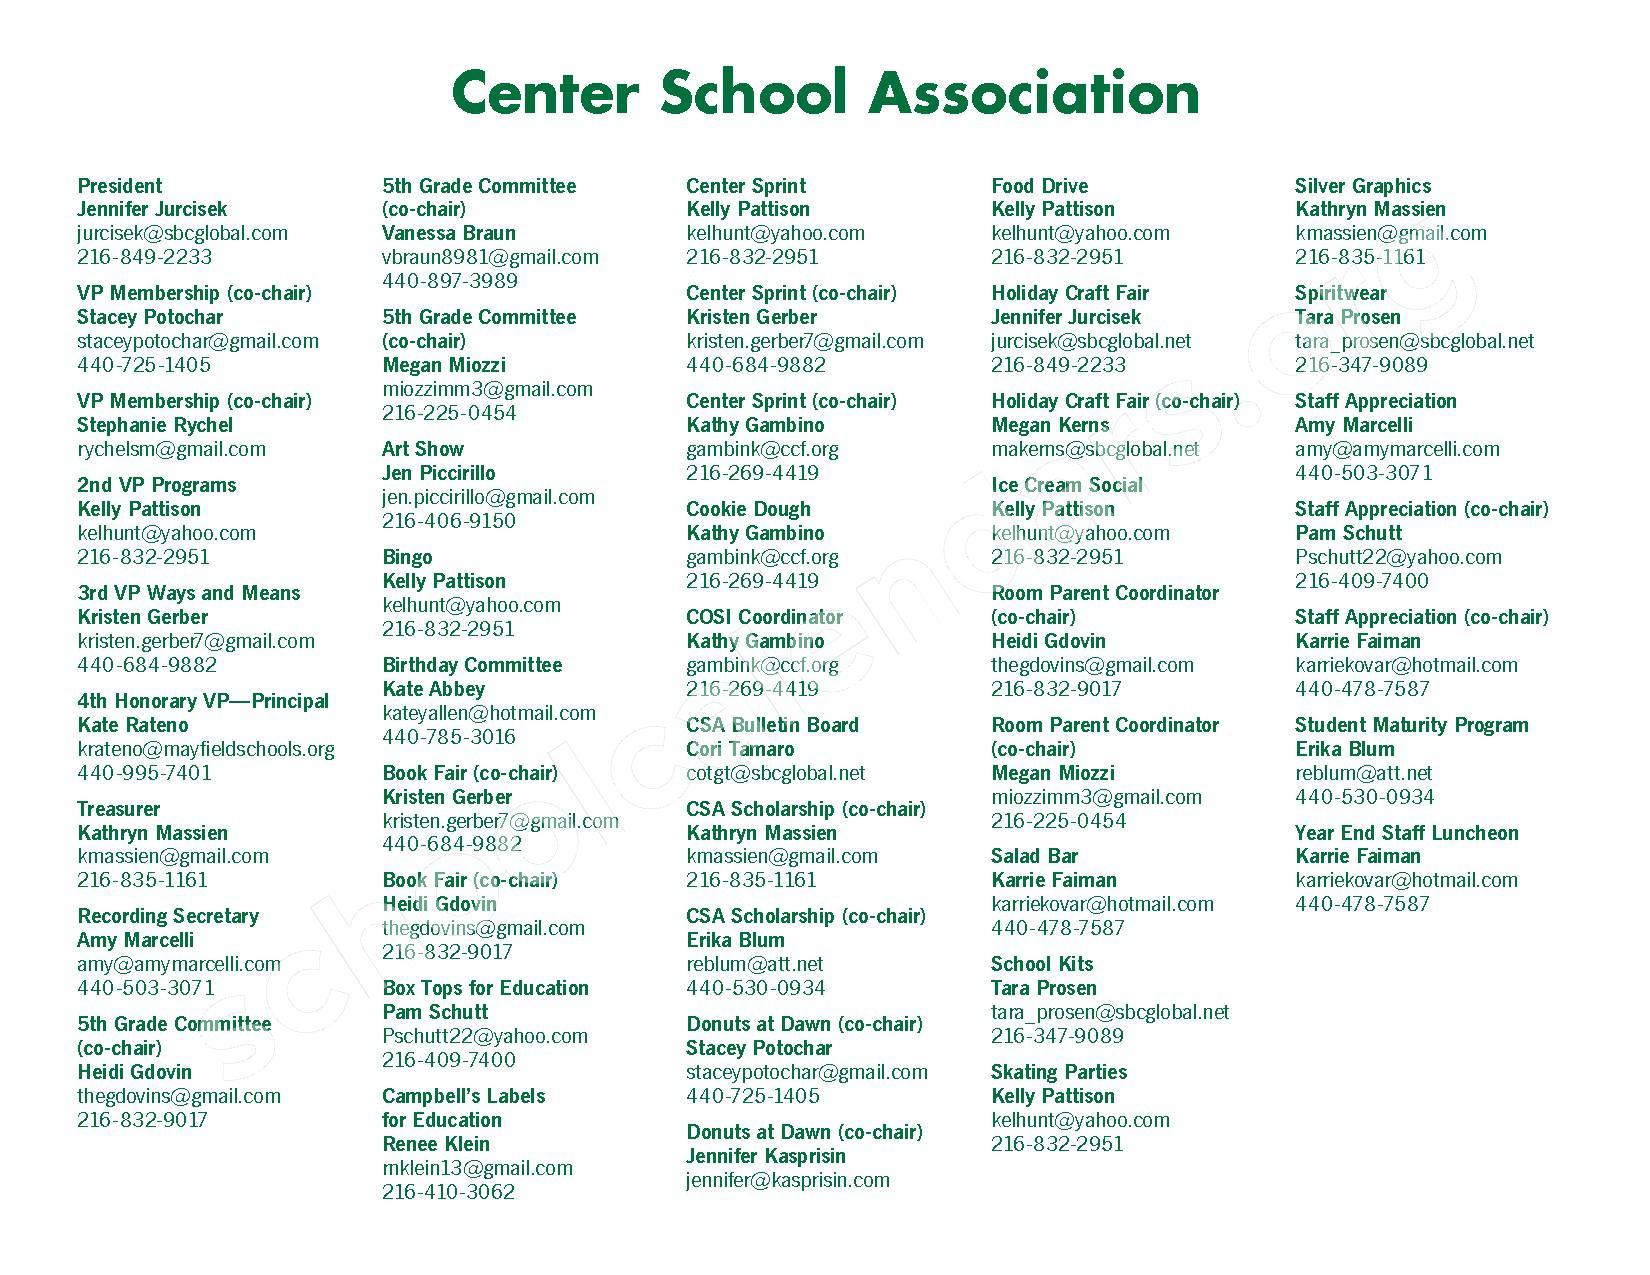 2016 - 2017 Mayfield Activities Calendar – Mayfield City Schools – page 32